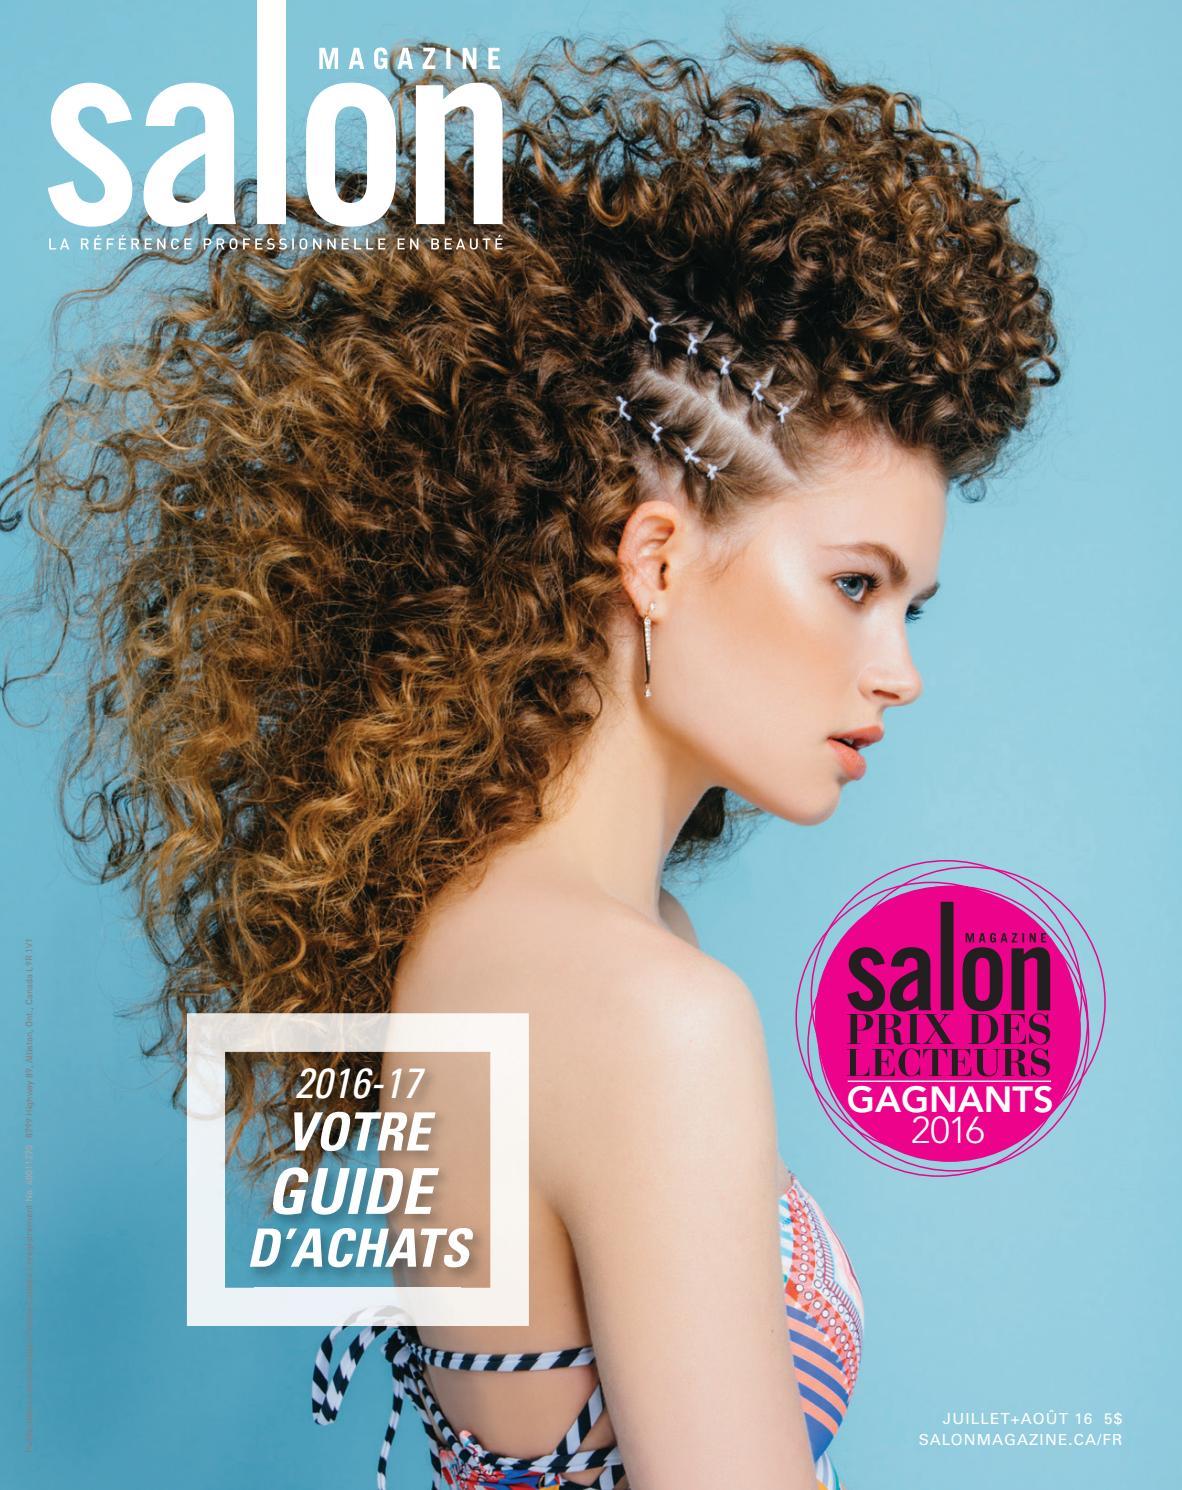 Hair amp nail choices aiibeauty - Salon Magazine Dition Fran Ais Juillet Ao T 2016 By Salon Communications Inc Issuu